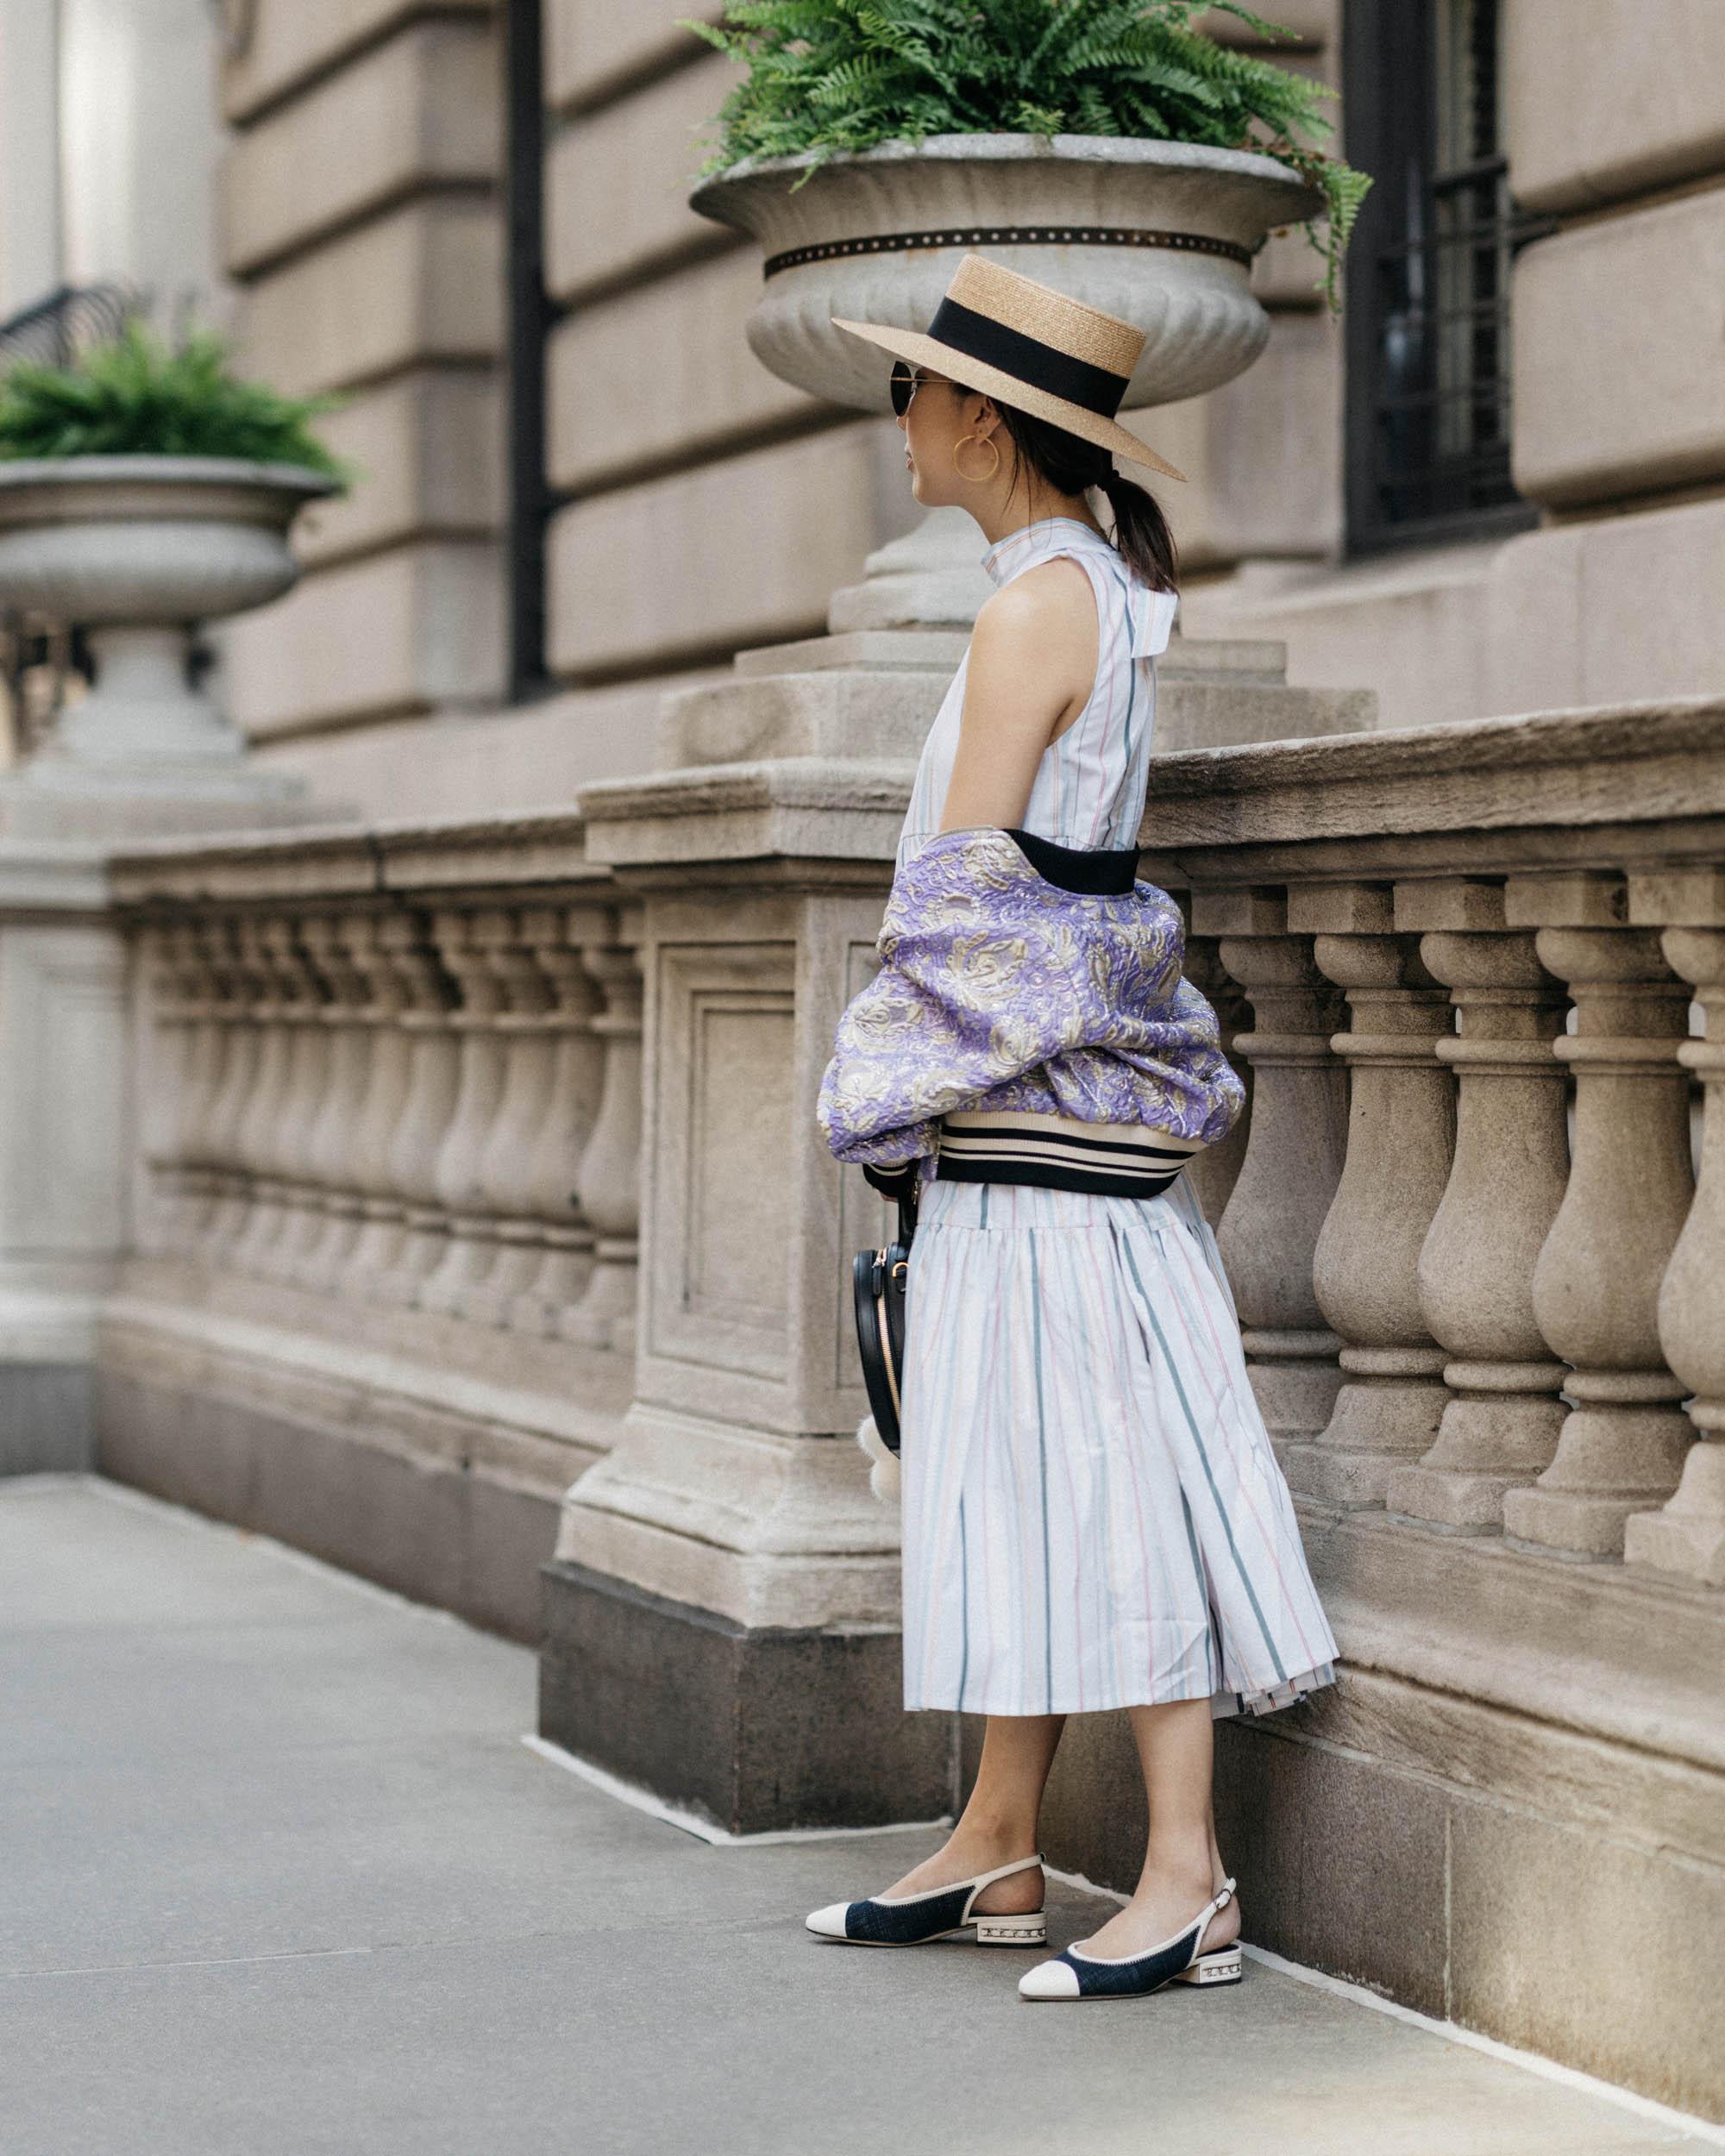 Dries Van Noten Jacket,  Asceno Dress , Chanel Shoes,  Mansur Gavriel Bag ,  Gucci Hat